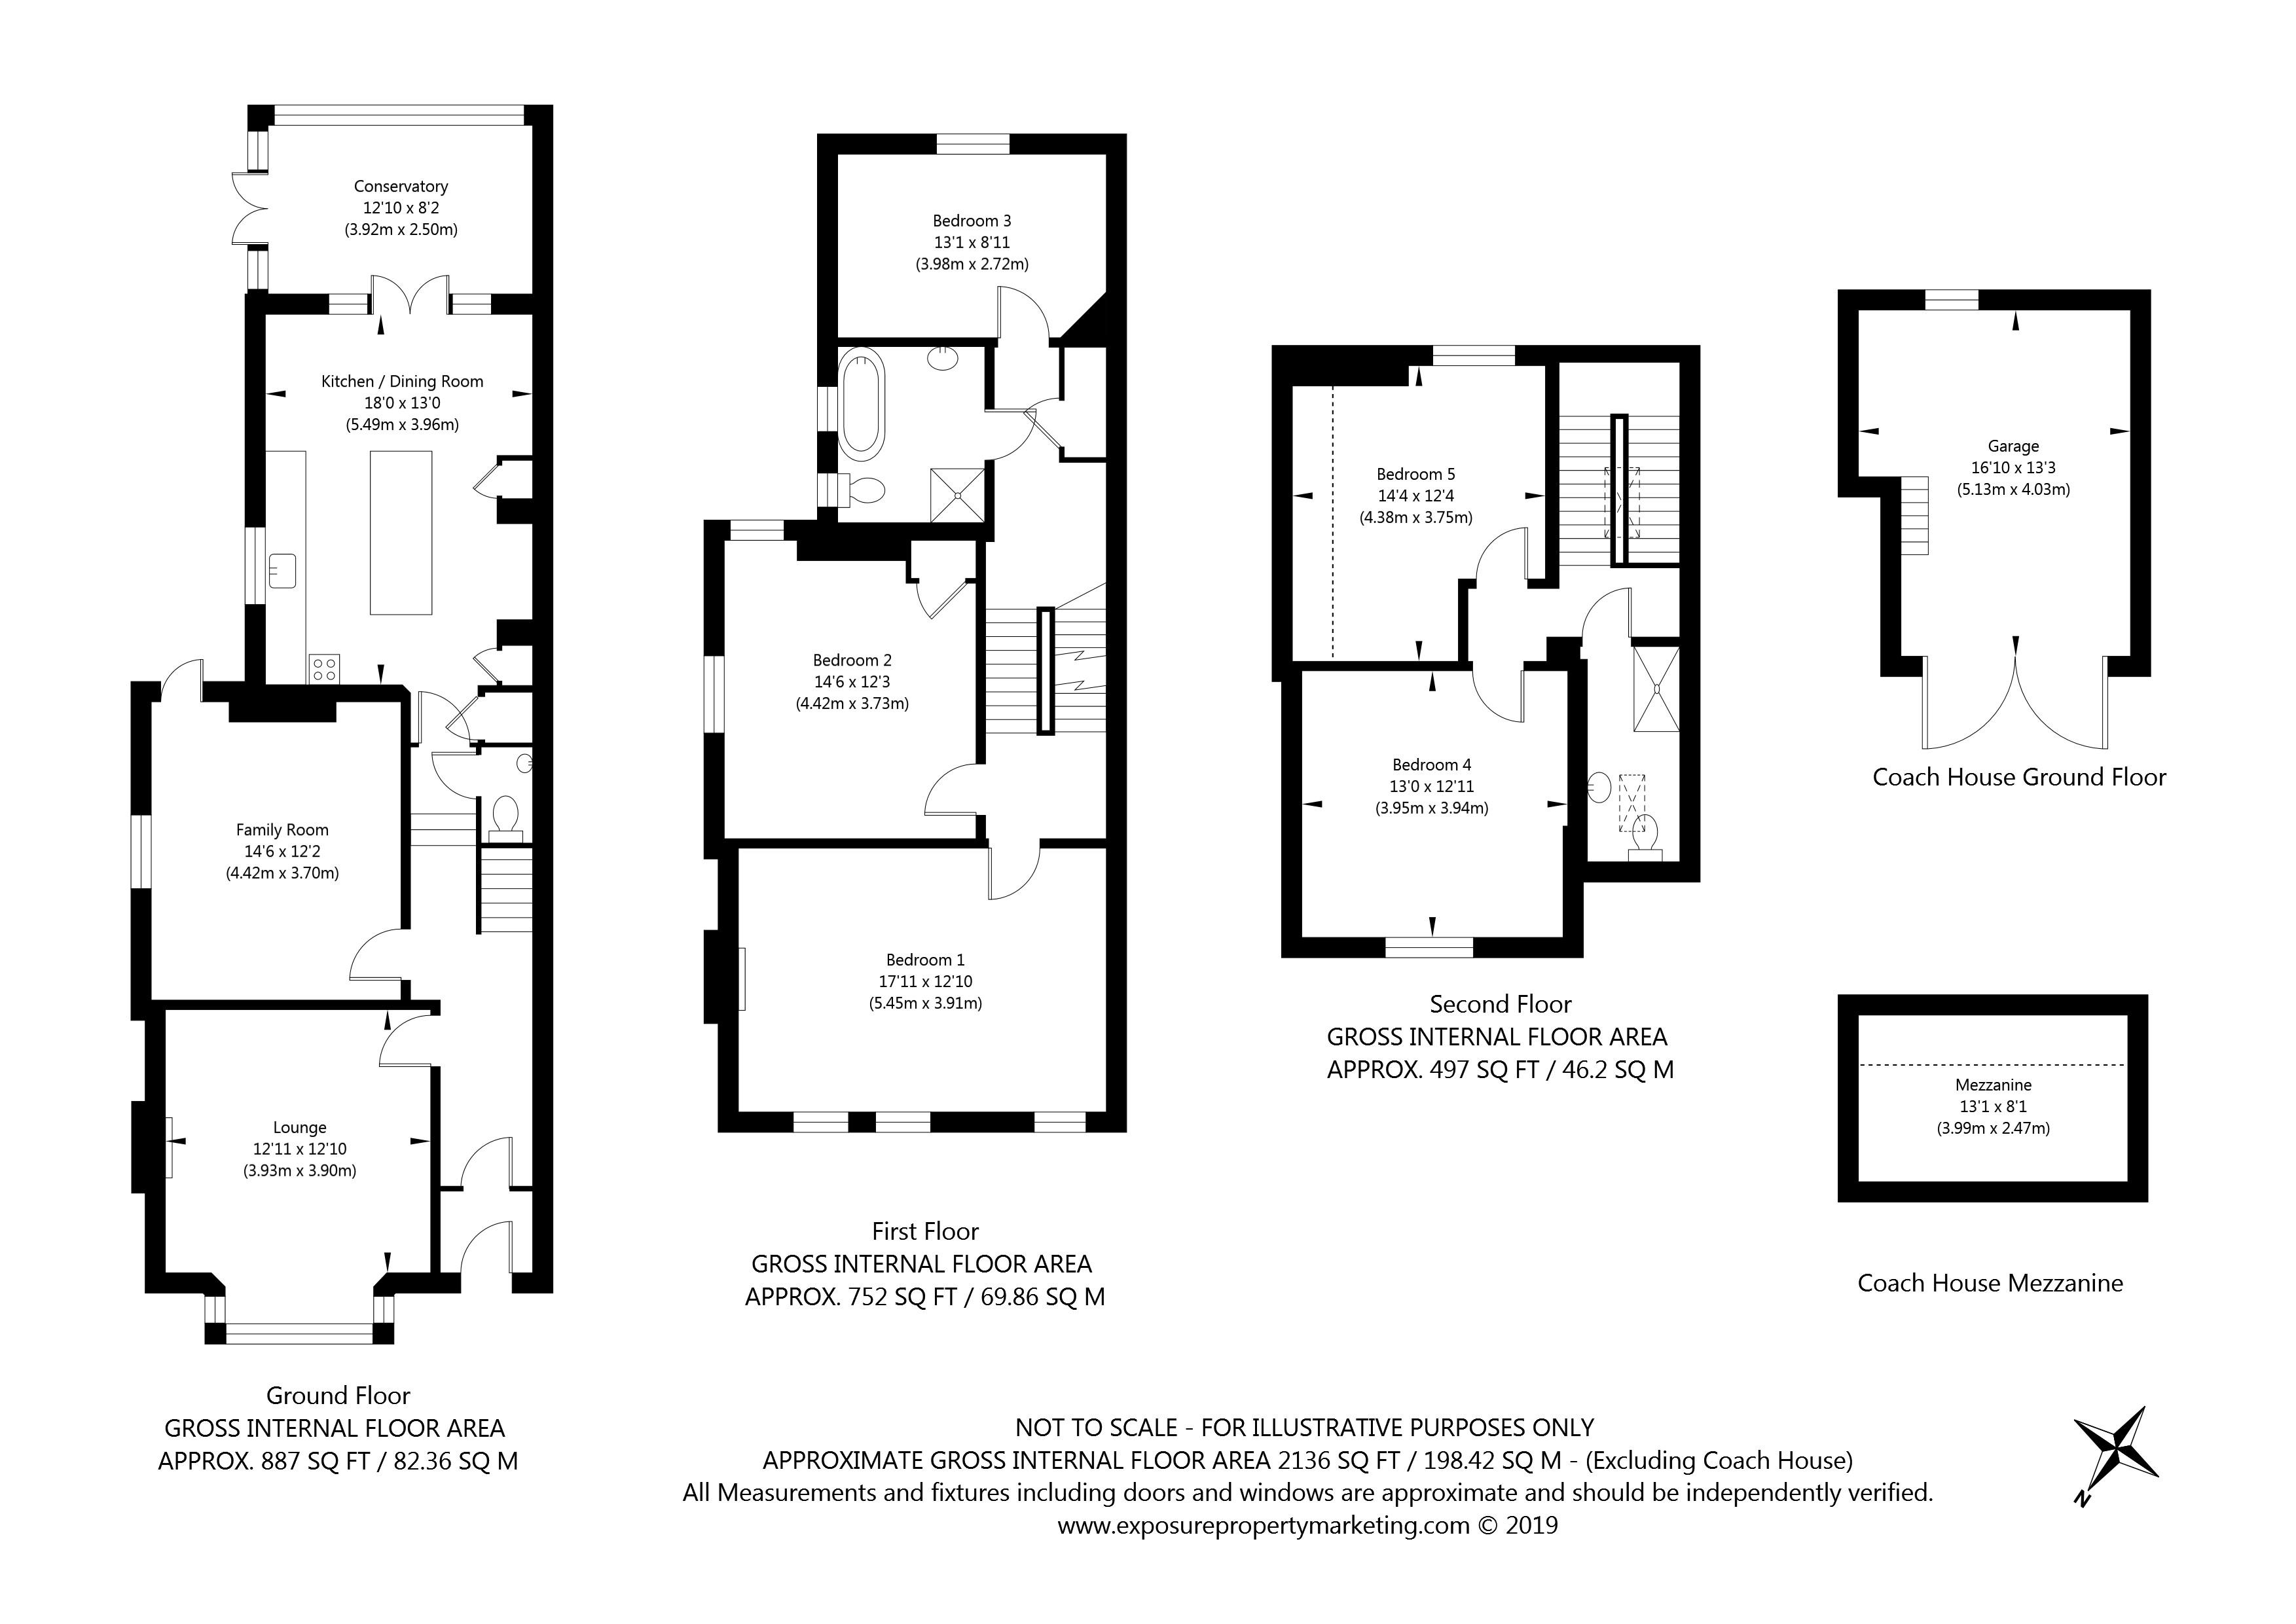 44 Burton Stone Lane, York property floorplan